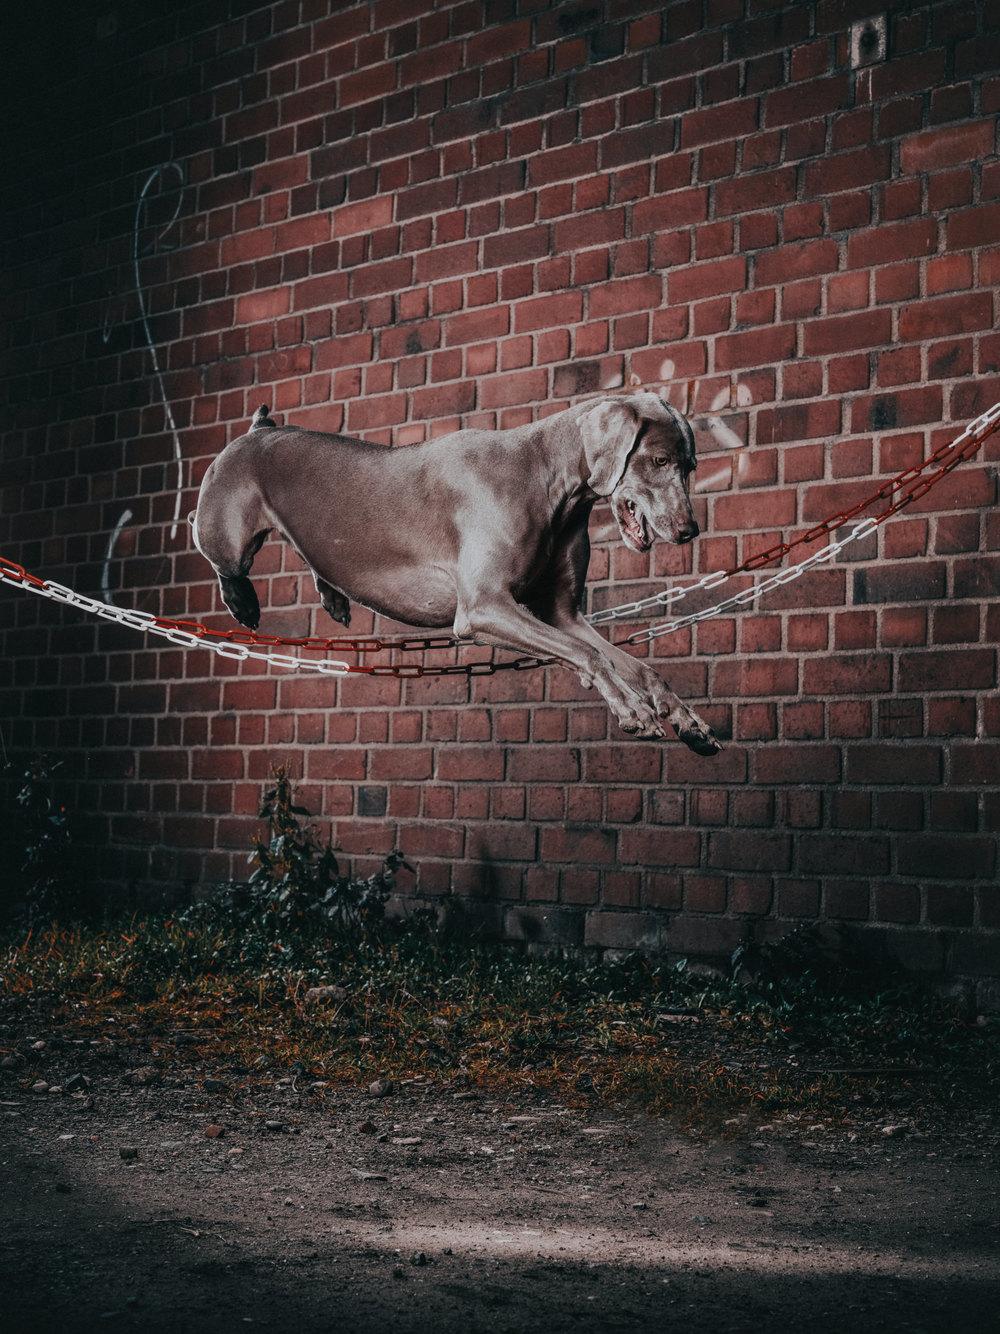 outdoor-dogs-klausdyba-10.jpg